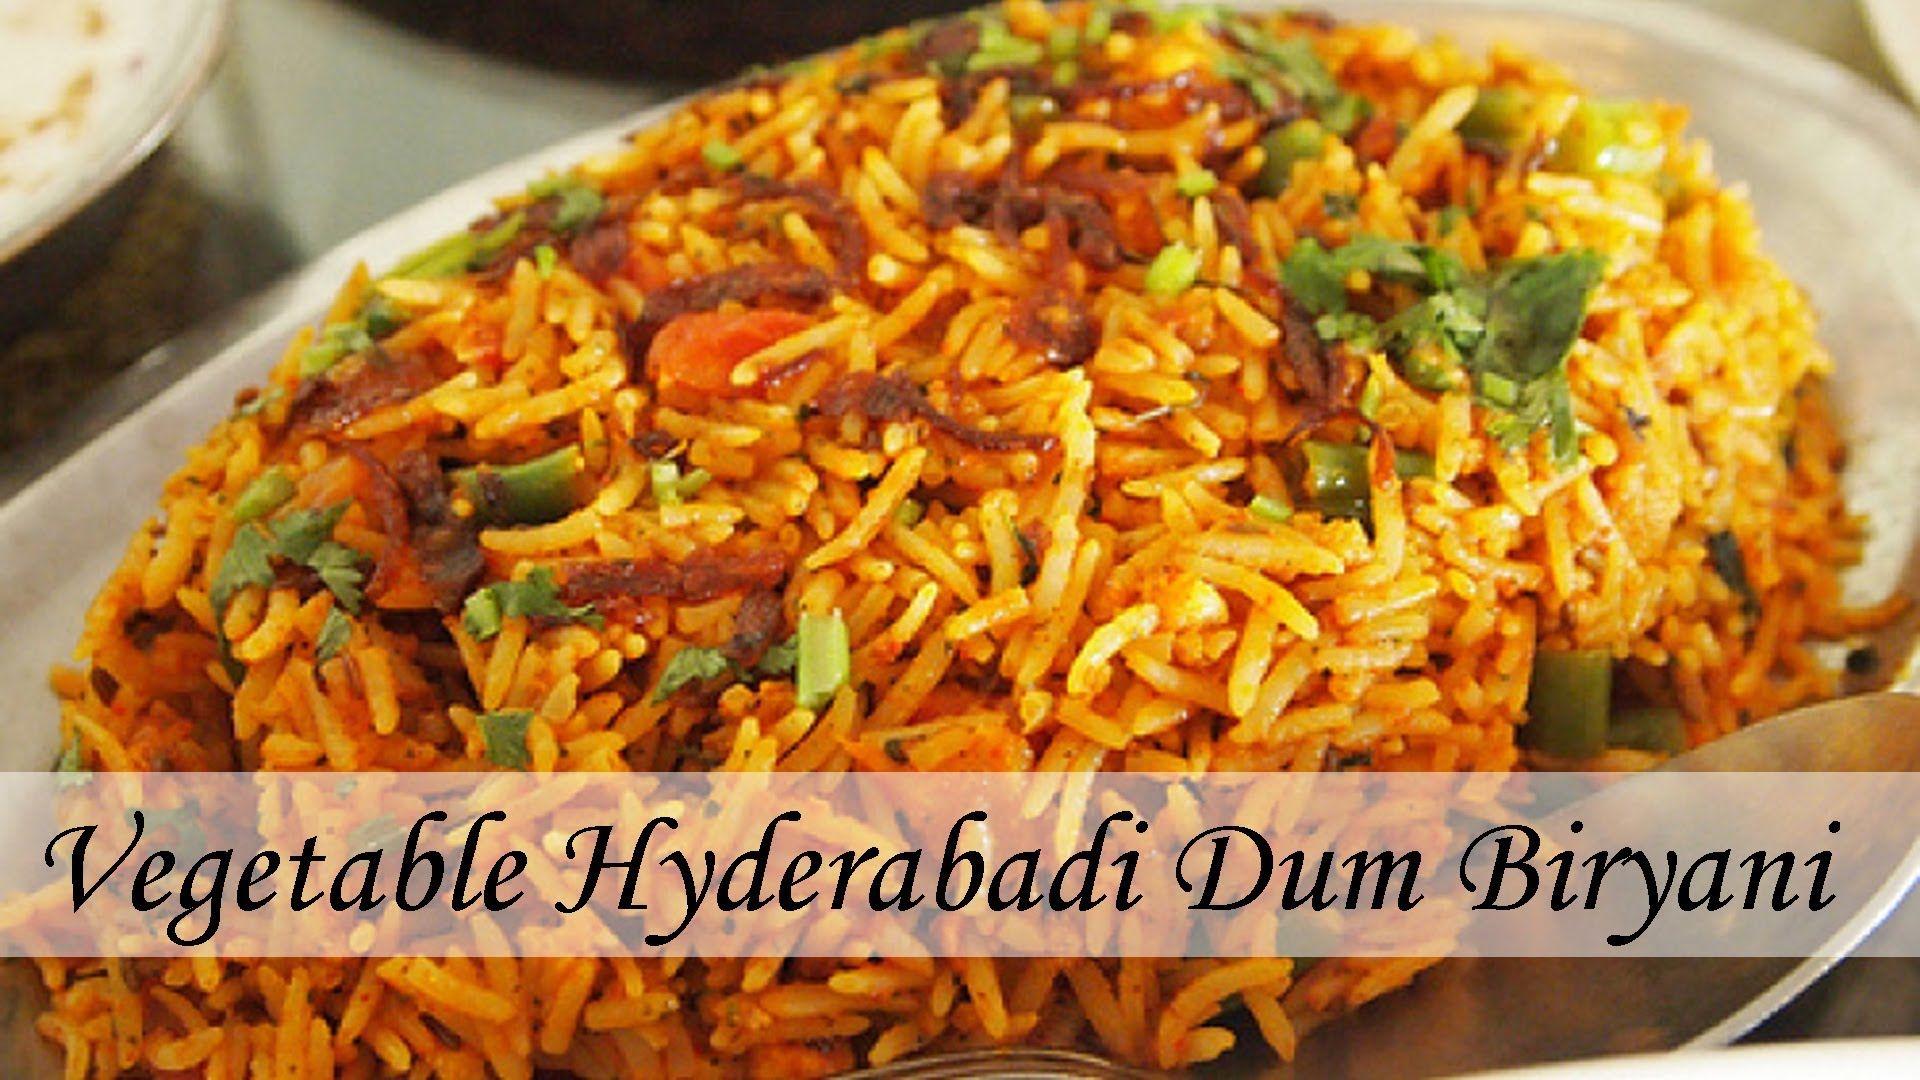 Spicy vegetable hyderabadi dum biryani recipe video recipes spicy vegetable hyderabadi dum biryani recipe video forumfinder Choice Image